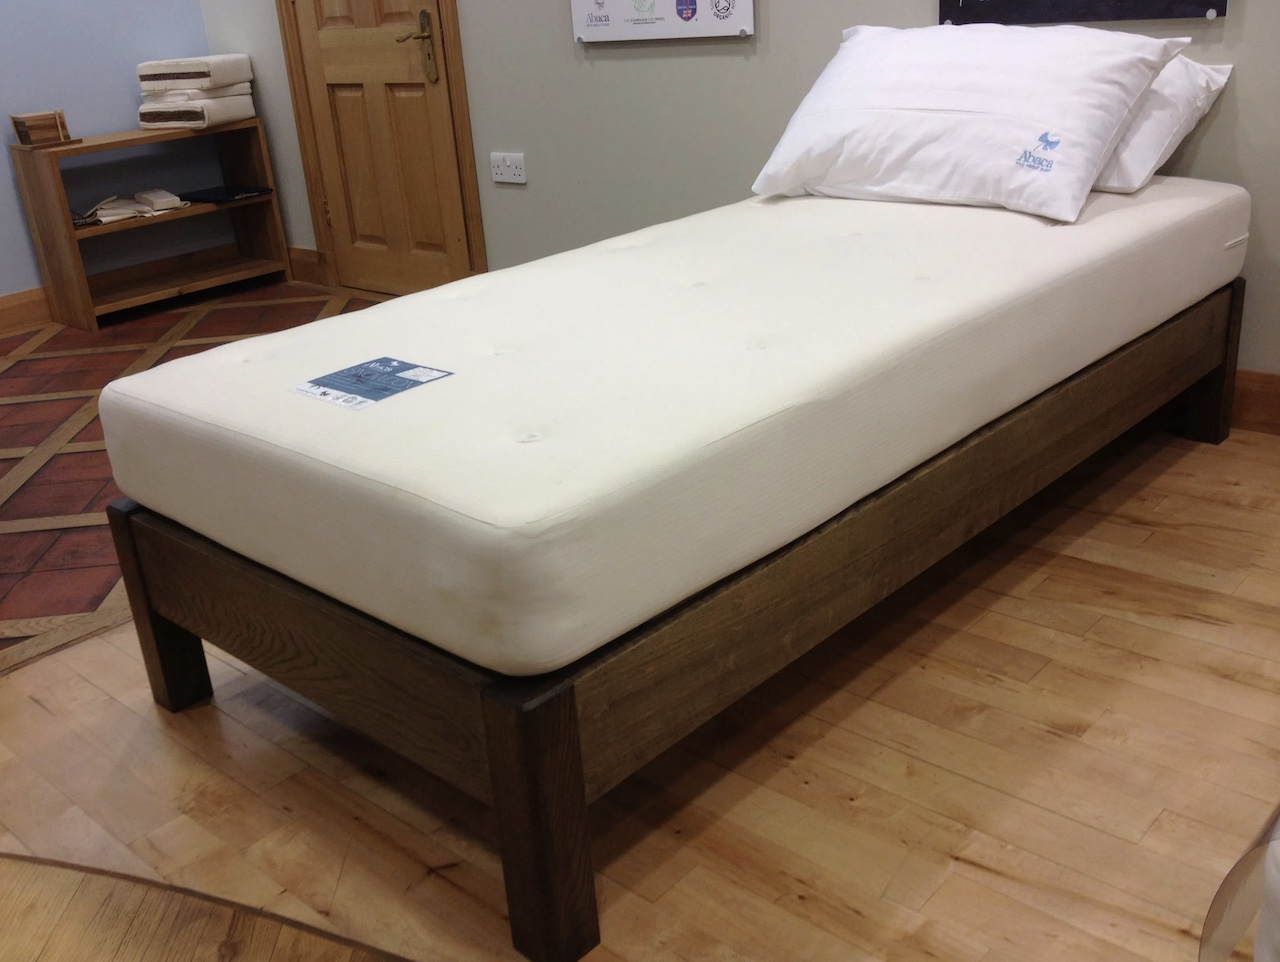 The Snowdon Abaca mattress